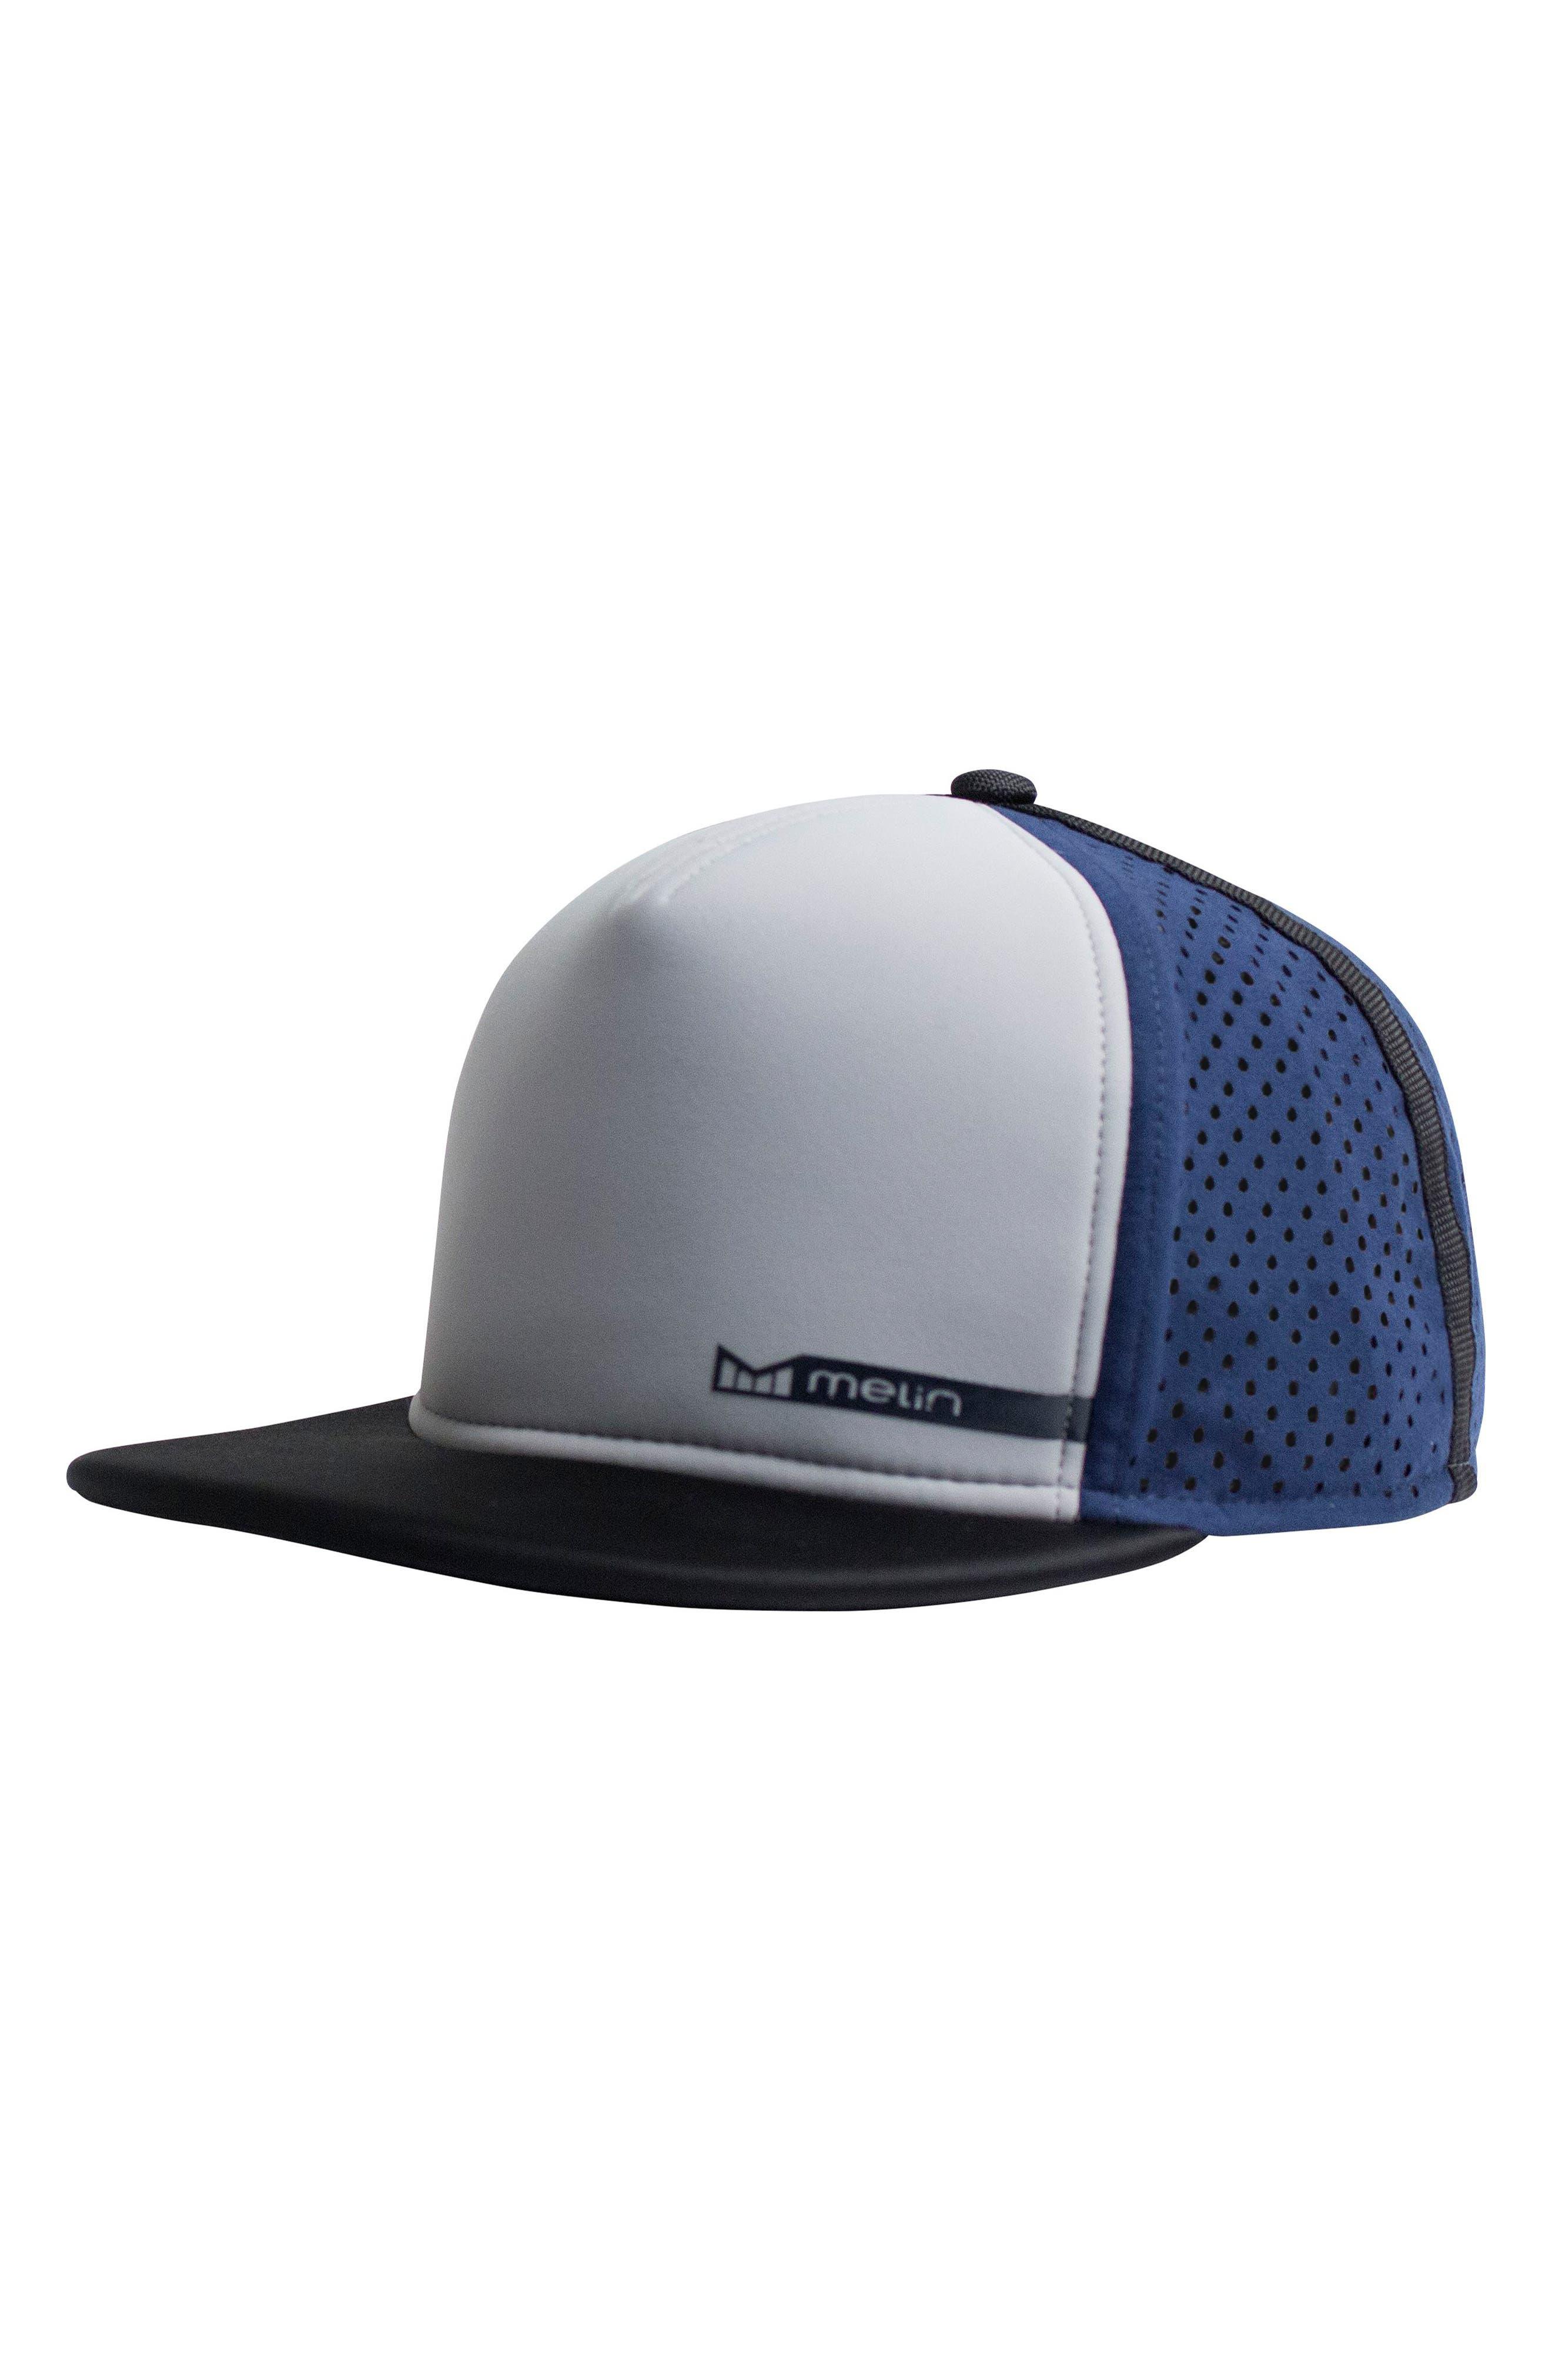 Melin 'Amphibian' Split Fit Snapback Baseball Cap